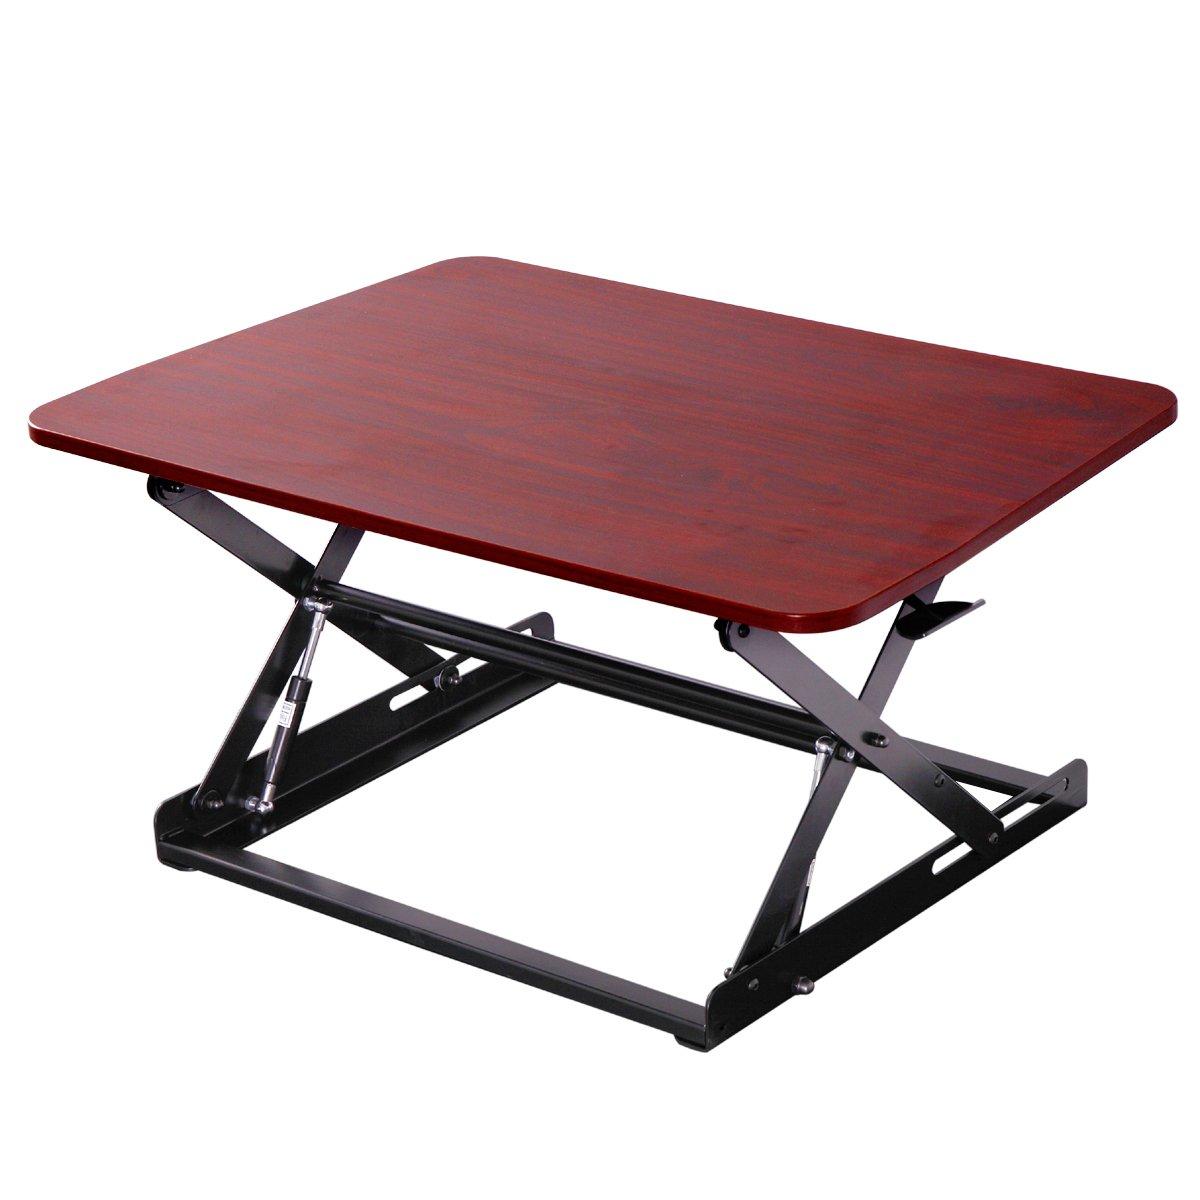 Ergonomic 30'' Wide Preassembled Height Adjustable Standing Desk Riser/ Stand Workstation Elevating Desktop Removable Keyboard Tray, Cherry